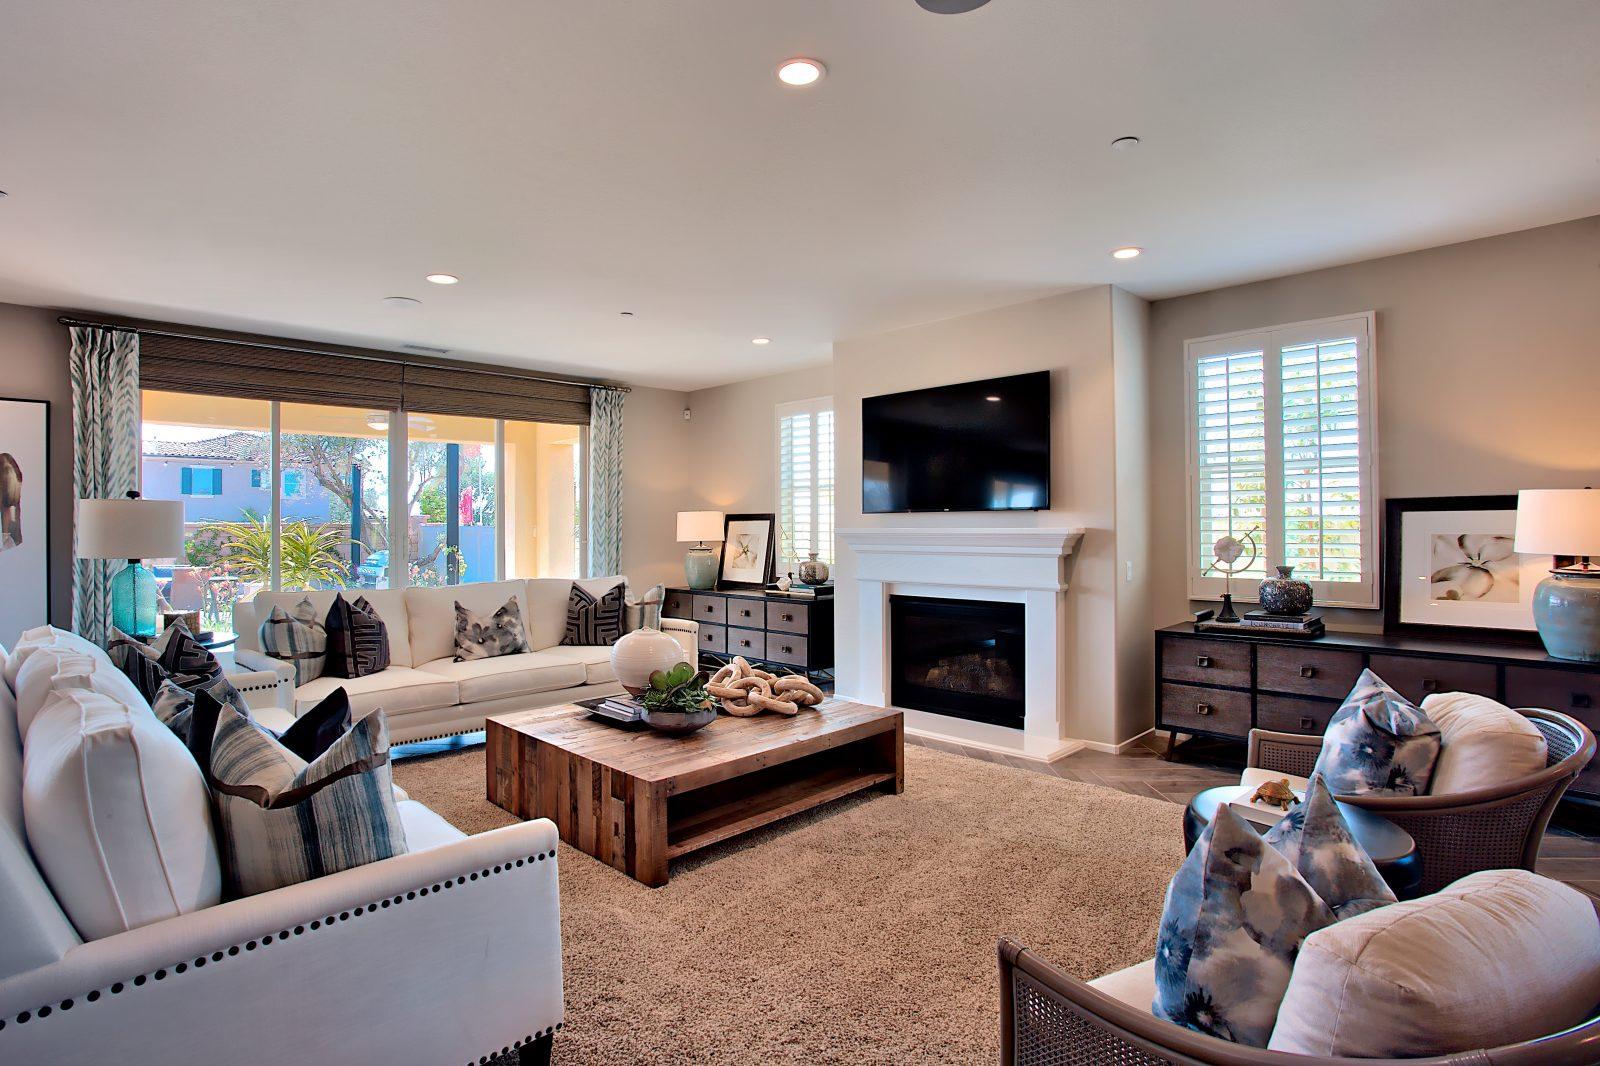 Homes For Sale In Murrieta Ca Juniper Aluminum Wiring California Living Room At Spencers Crossing Riverside Brookfield Residential